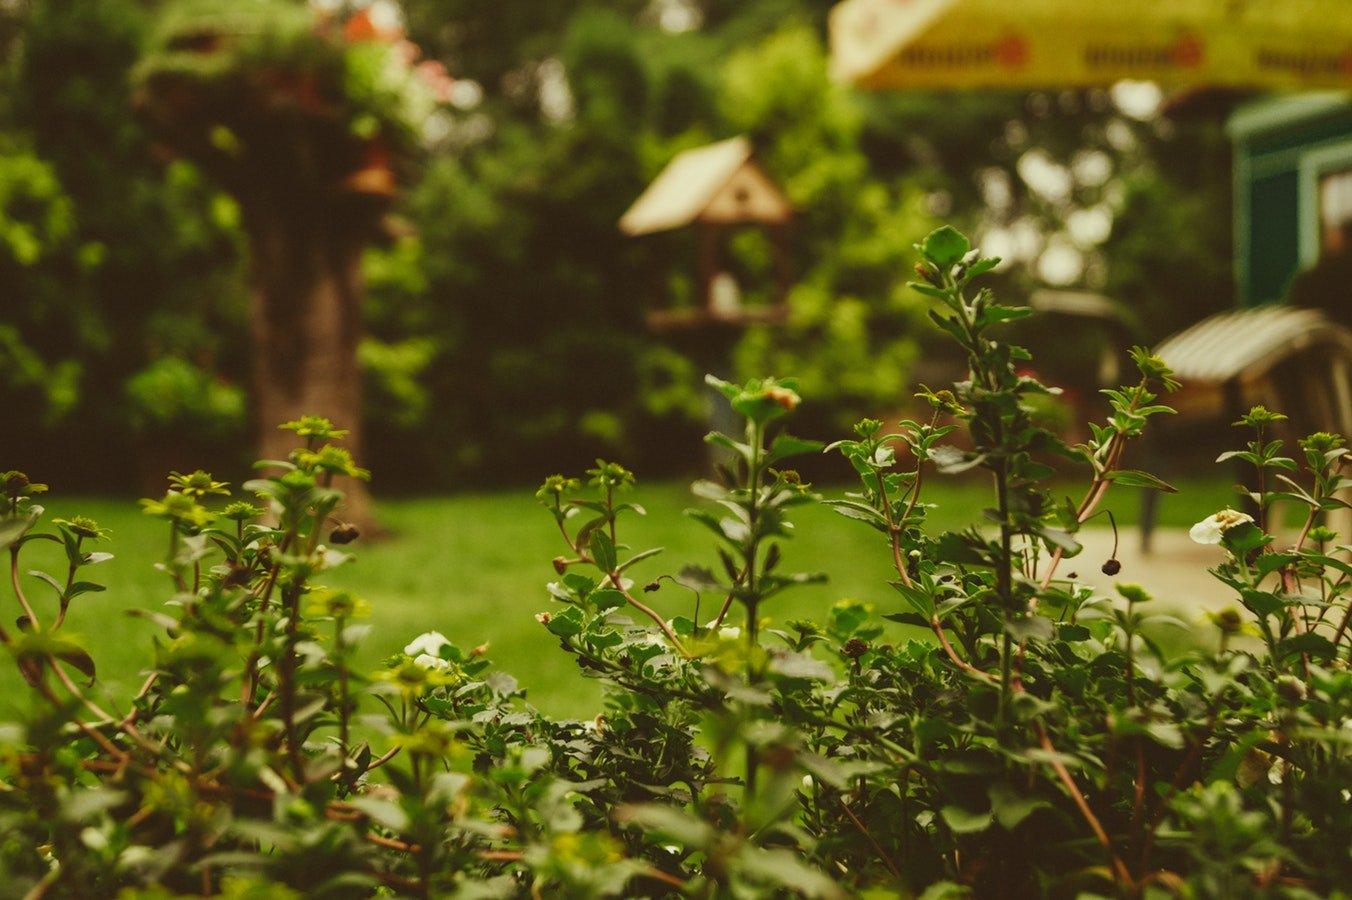 Tips for Your Summer Garden